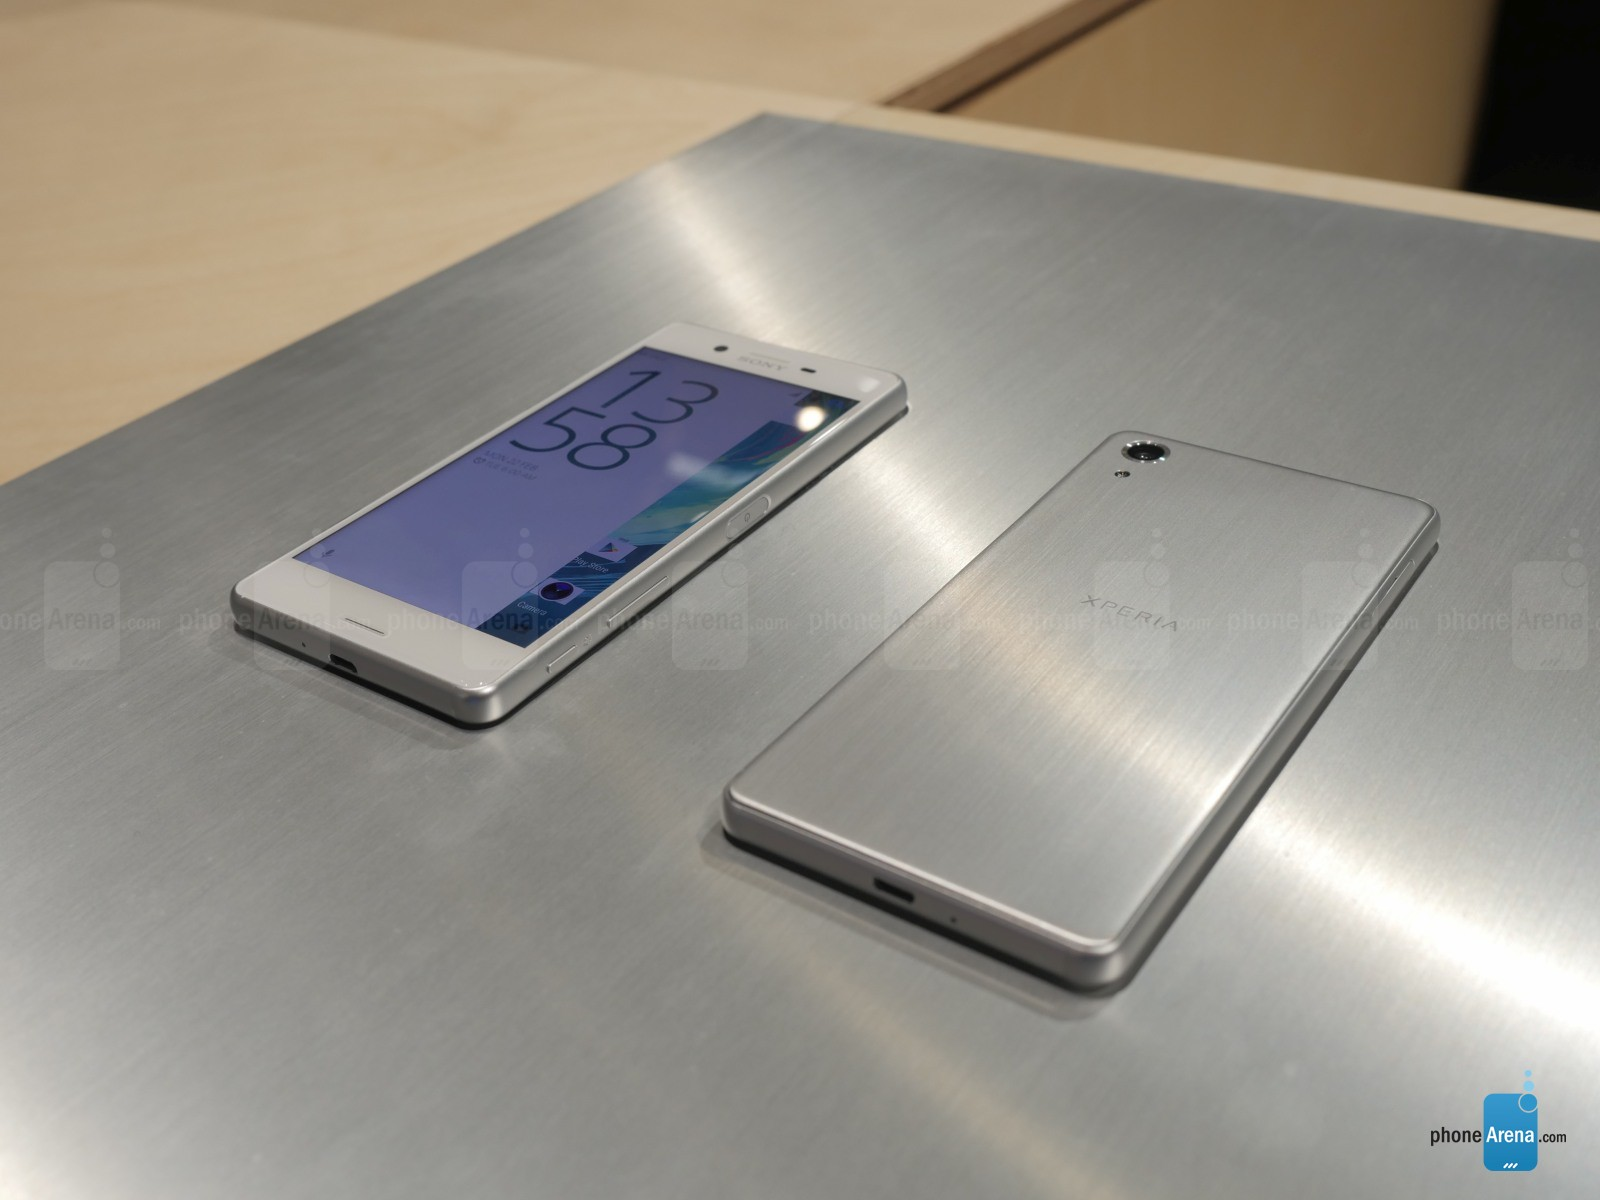 Sony-Xperia-X-Performance-hands-on-1.JPG